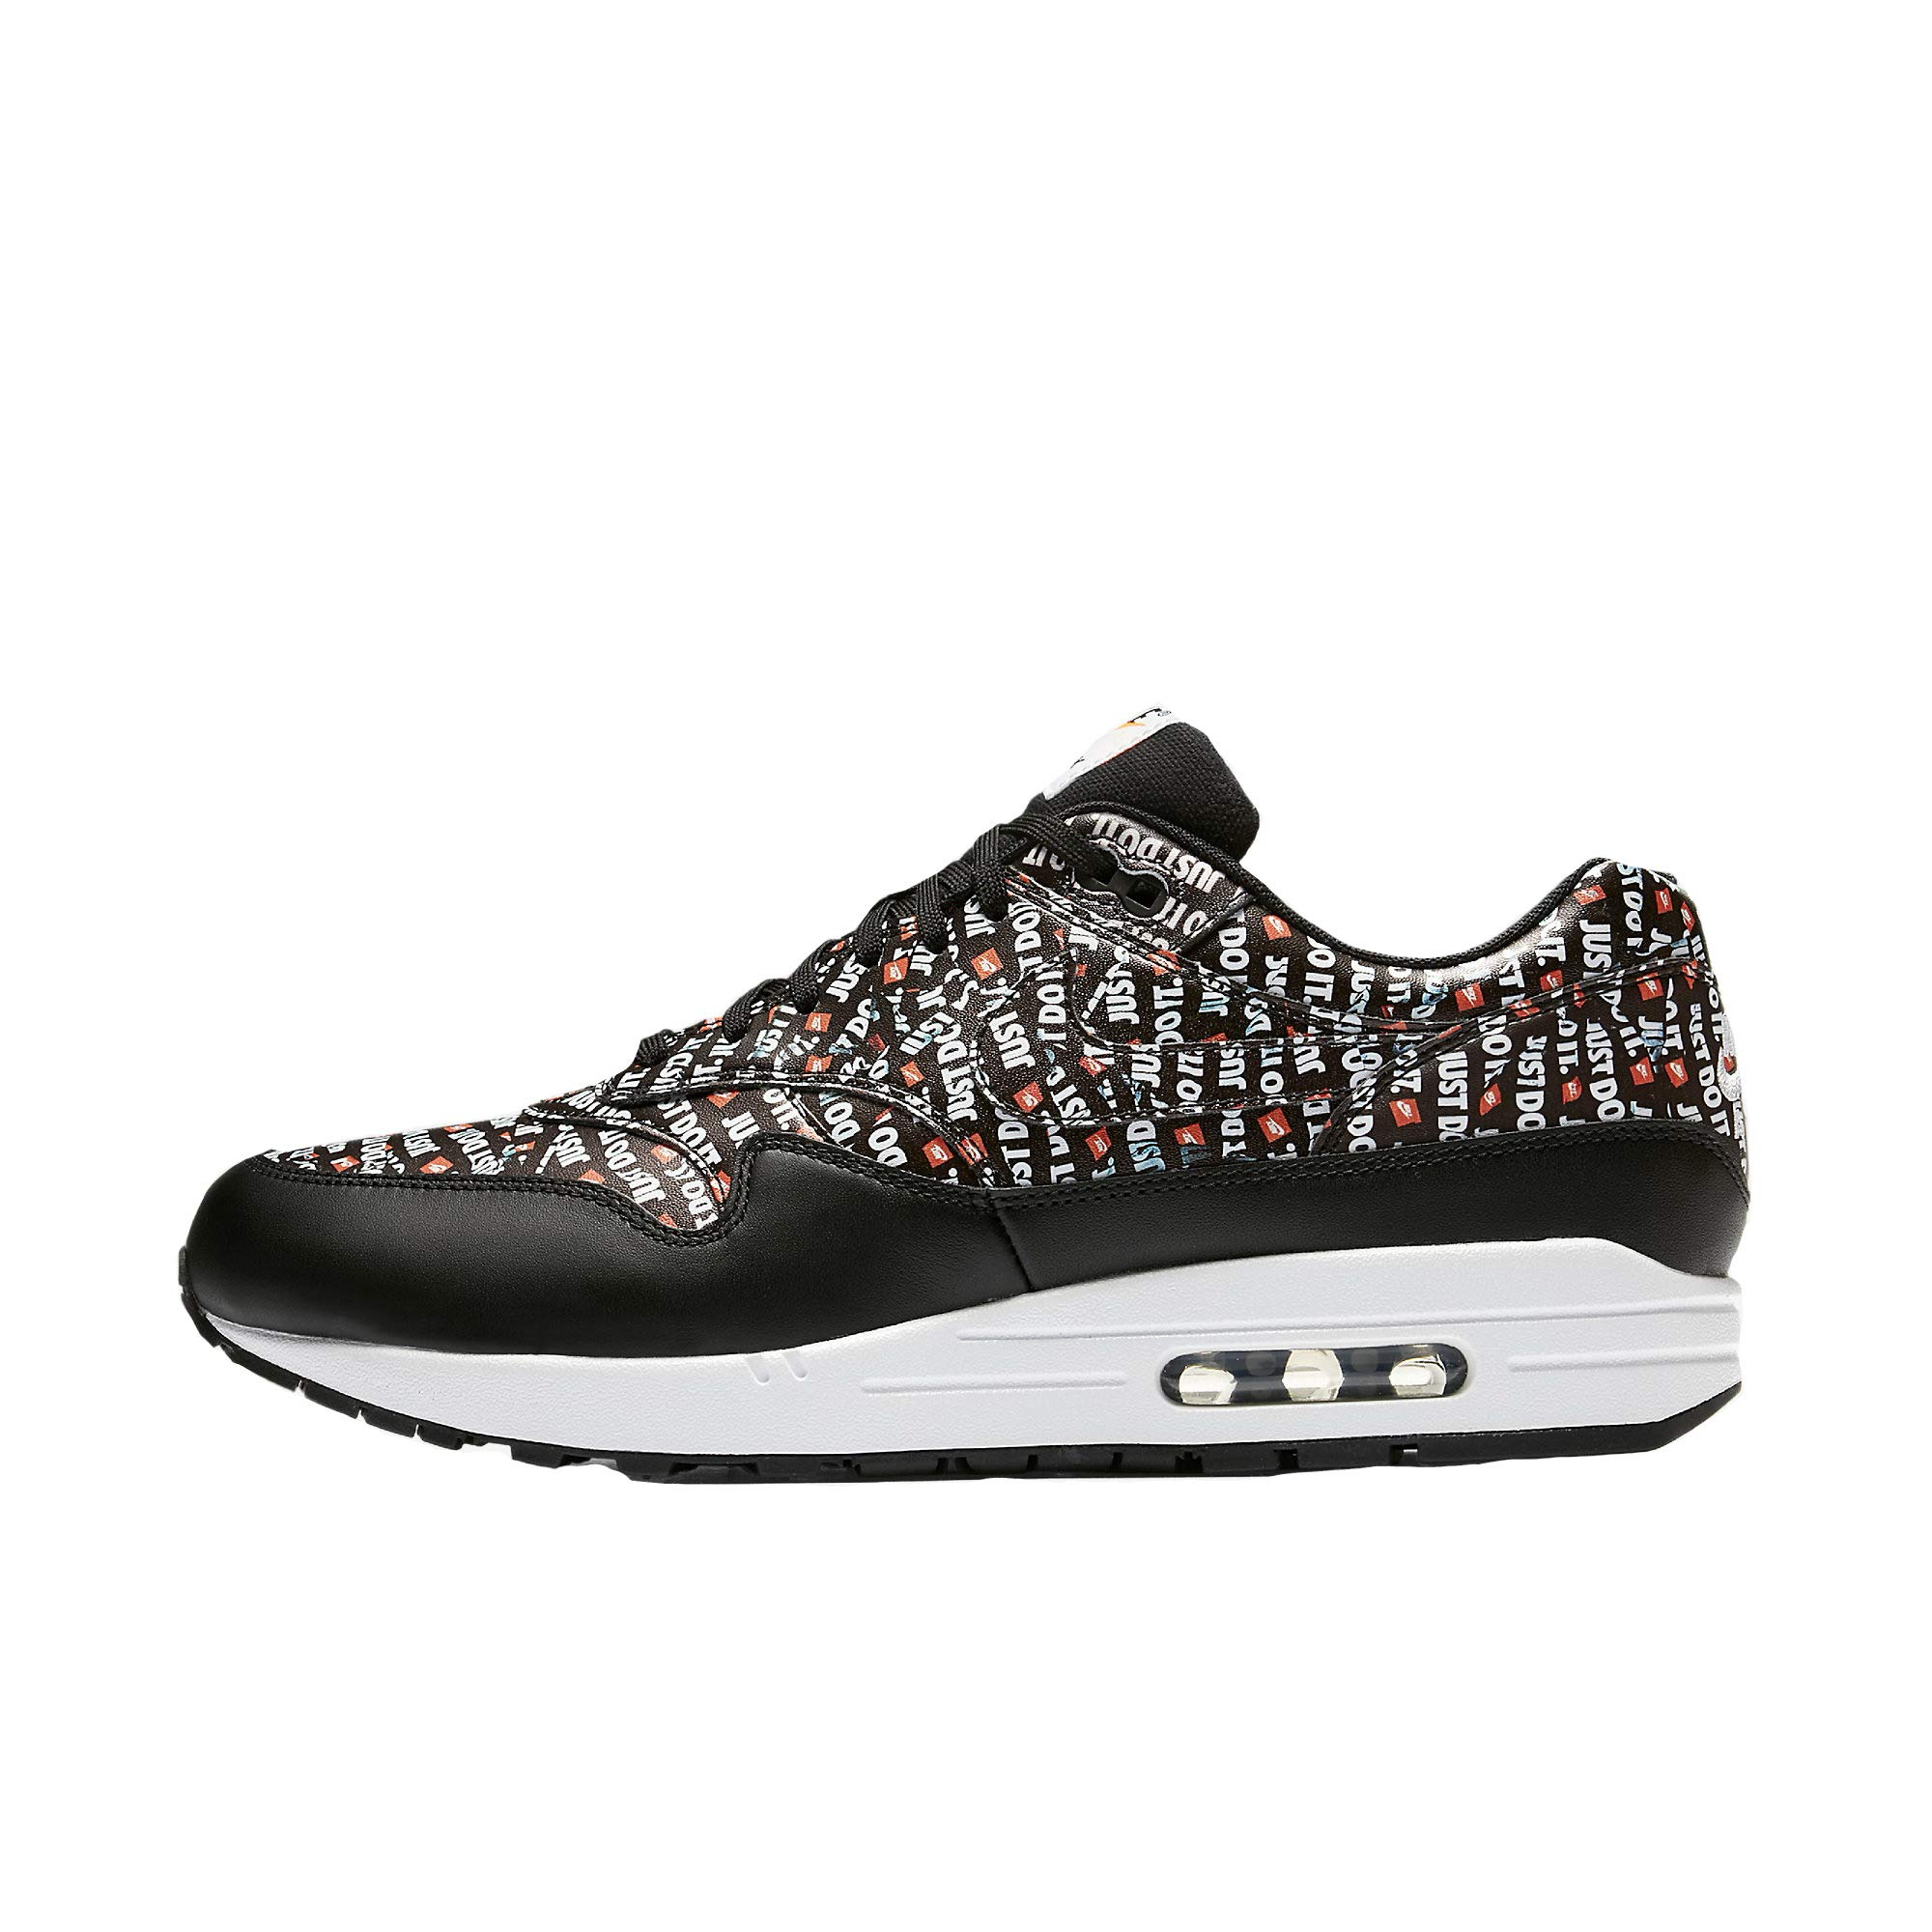 40b78ad0fe Galleon - Nike Air Max 1 Premium (Just Do It)